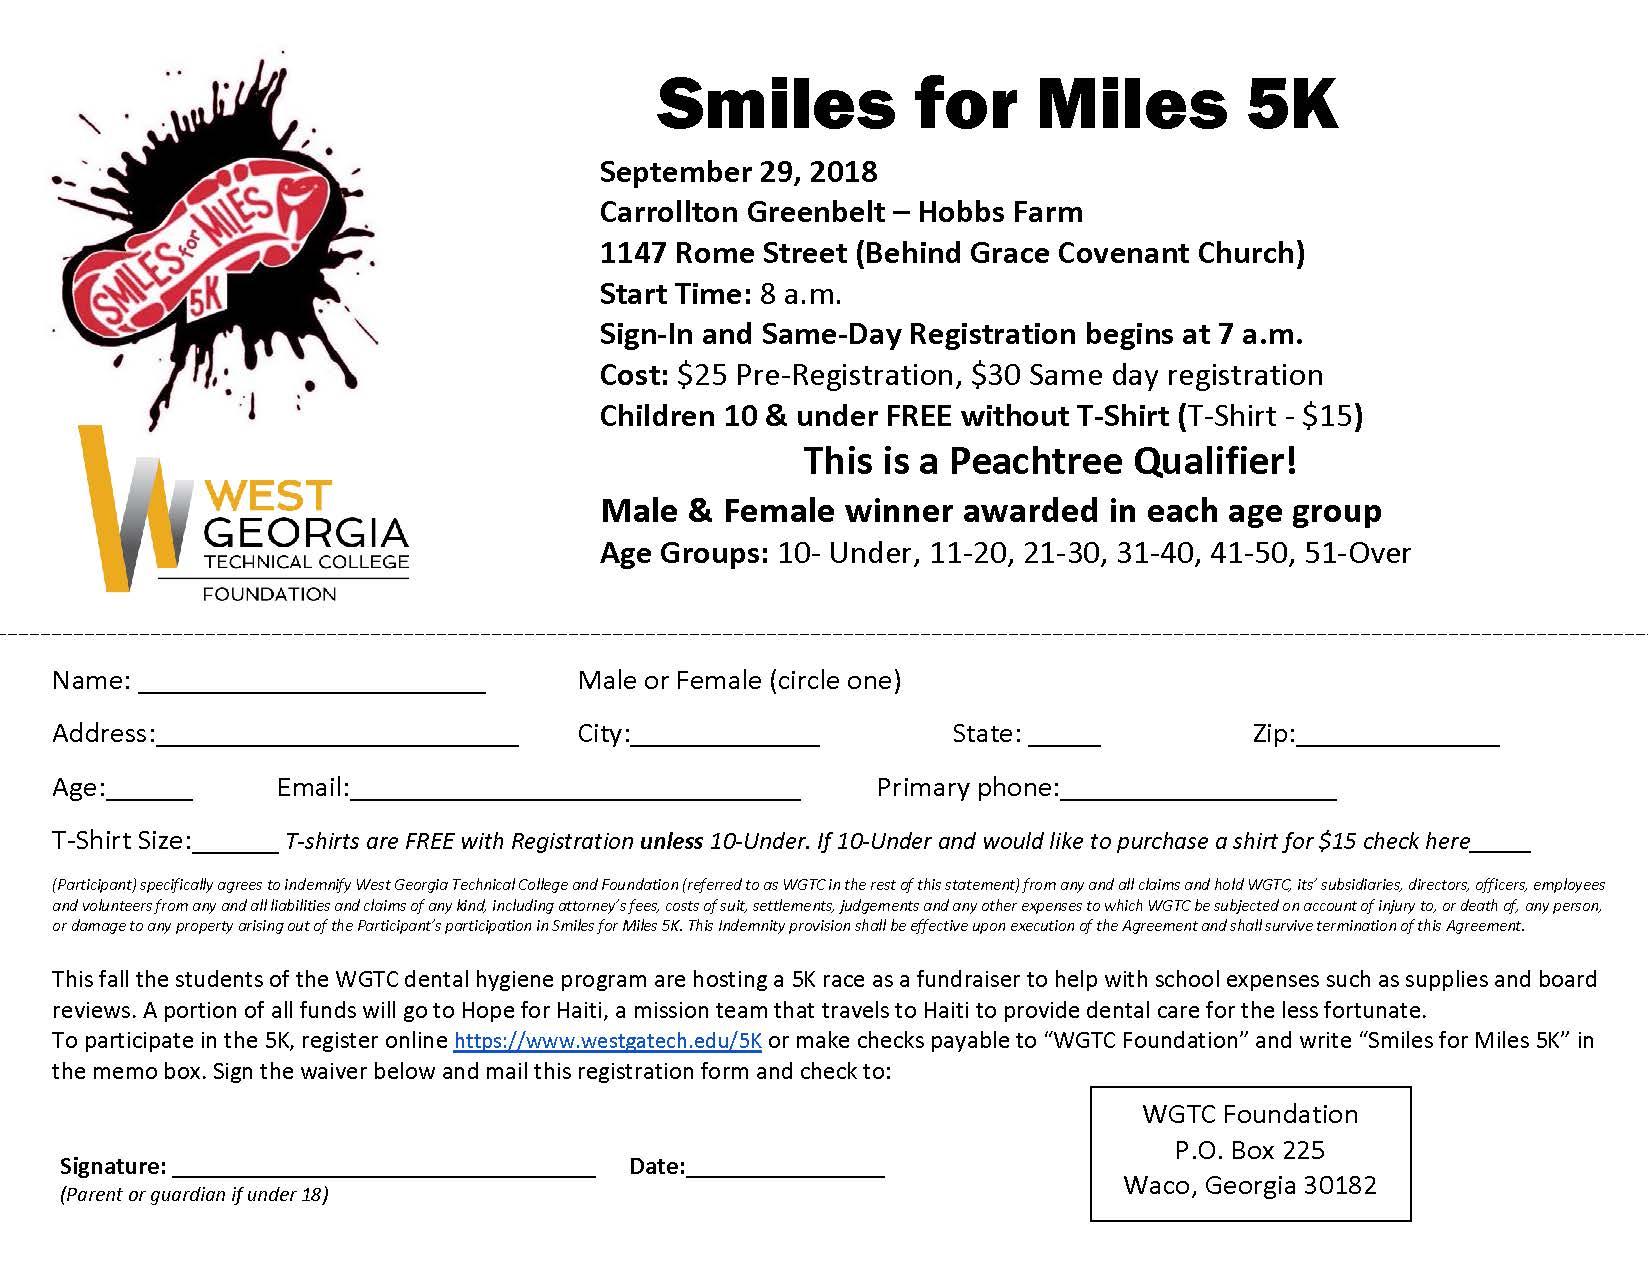 Smiles for Miles 5K flyer